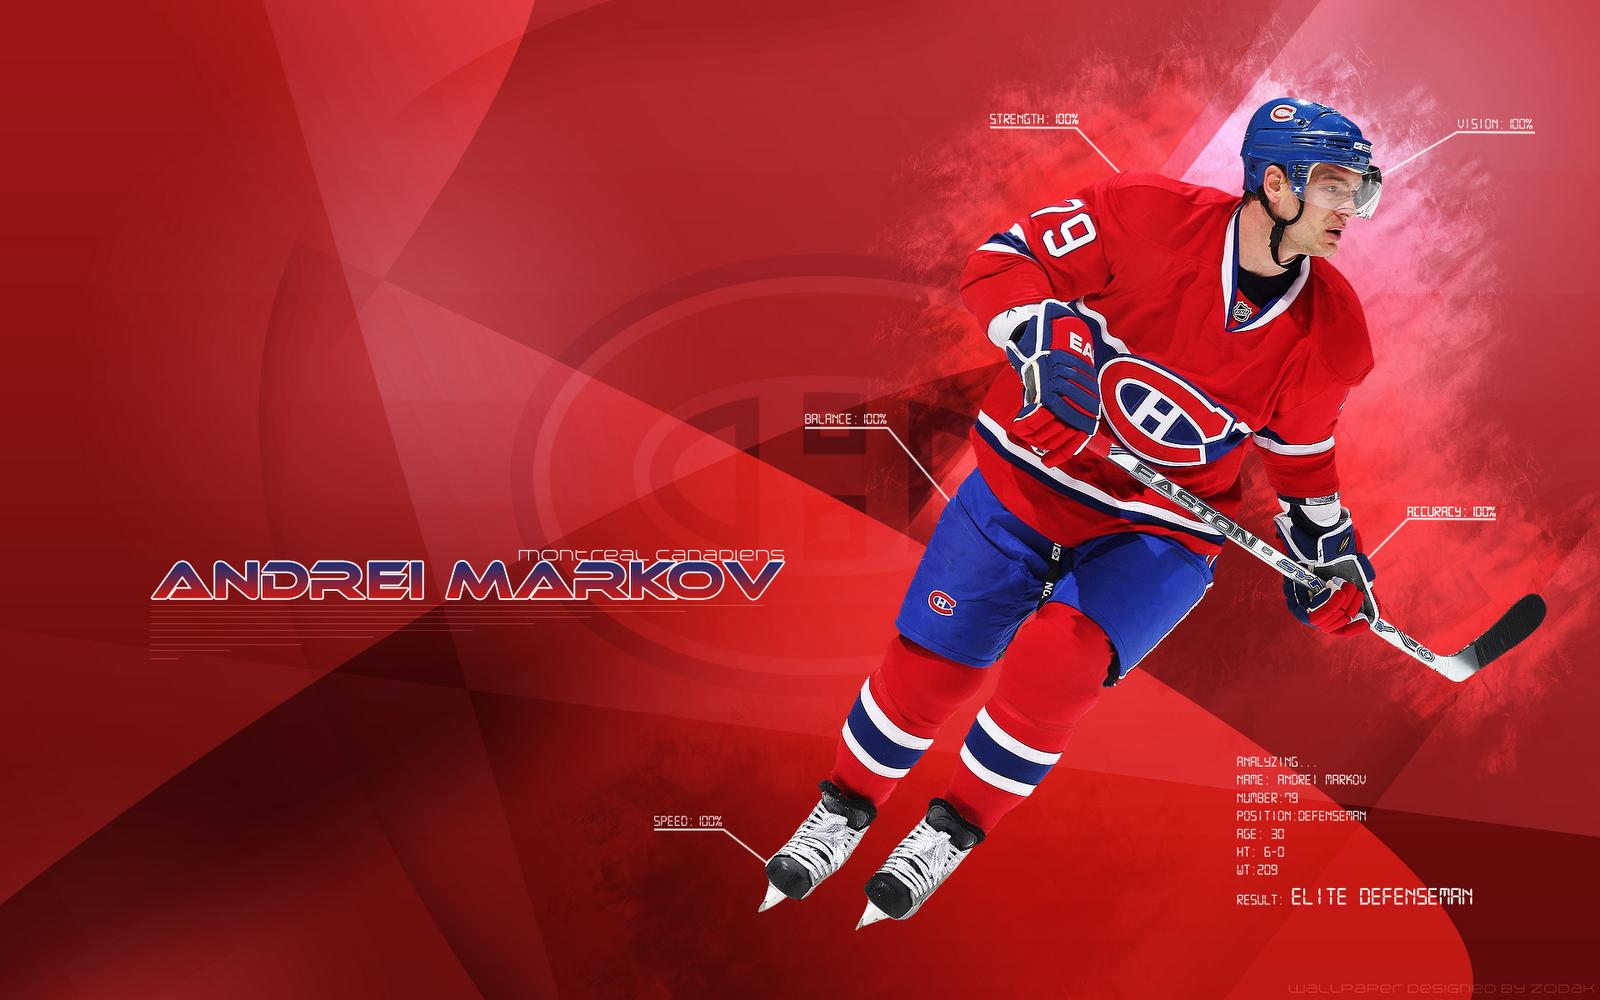 Carey price wallpapers montreal habs montreal hockey 9 html code - De J R Me Dufour Wallpaper Andrei Markov Montreal Canadiens